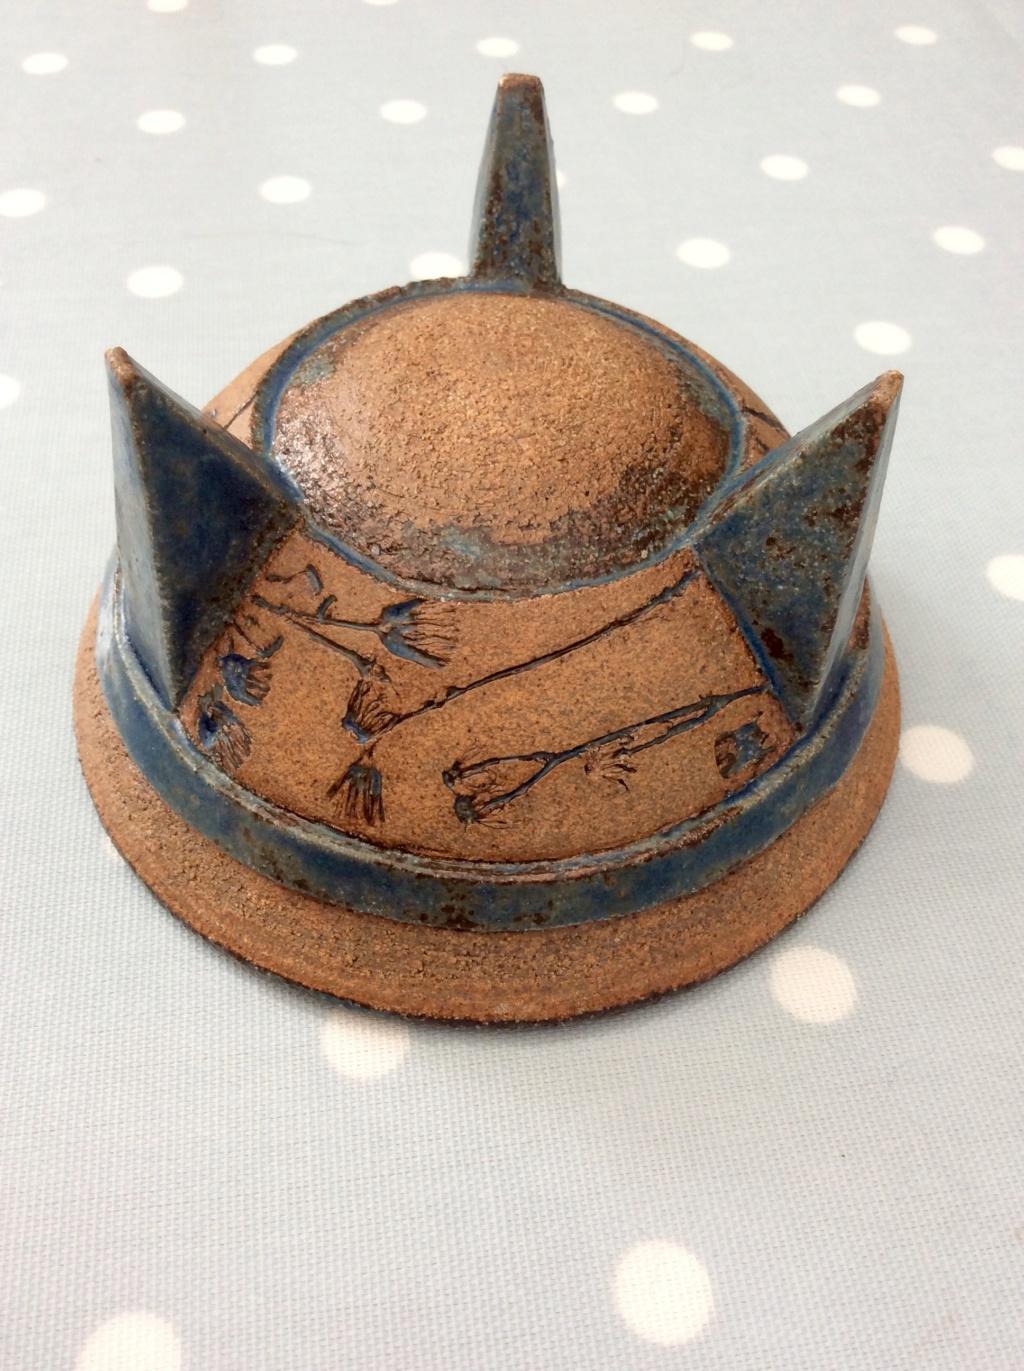 British Pottery Three-Legged Bowl - Mark similar to Hans Coper 17f21610